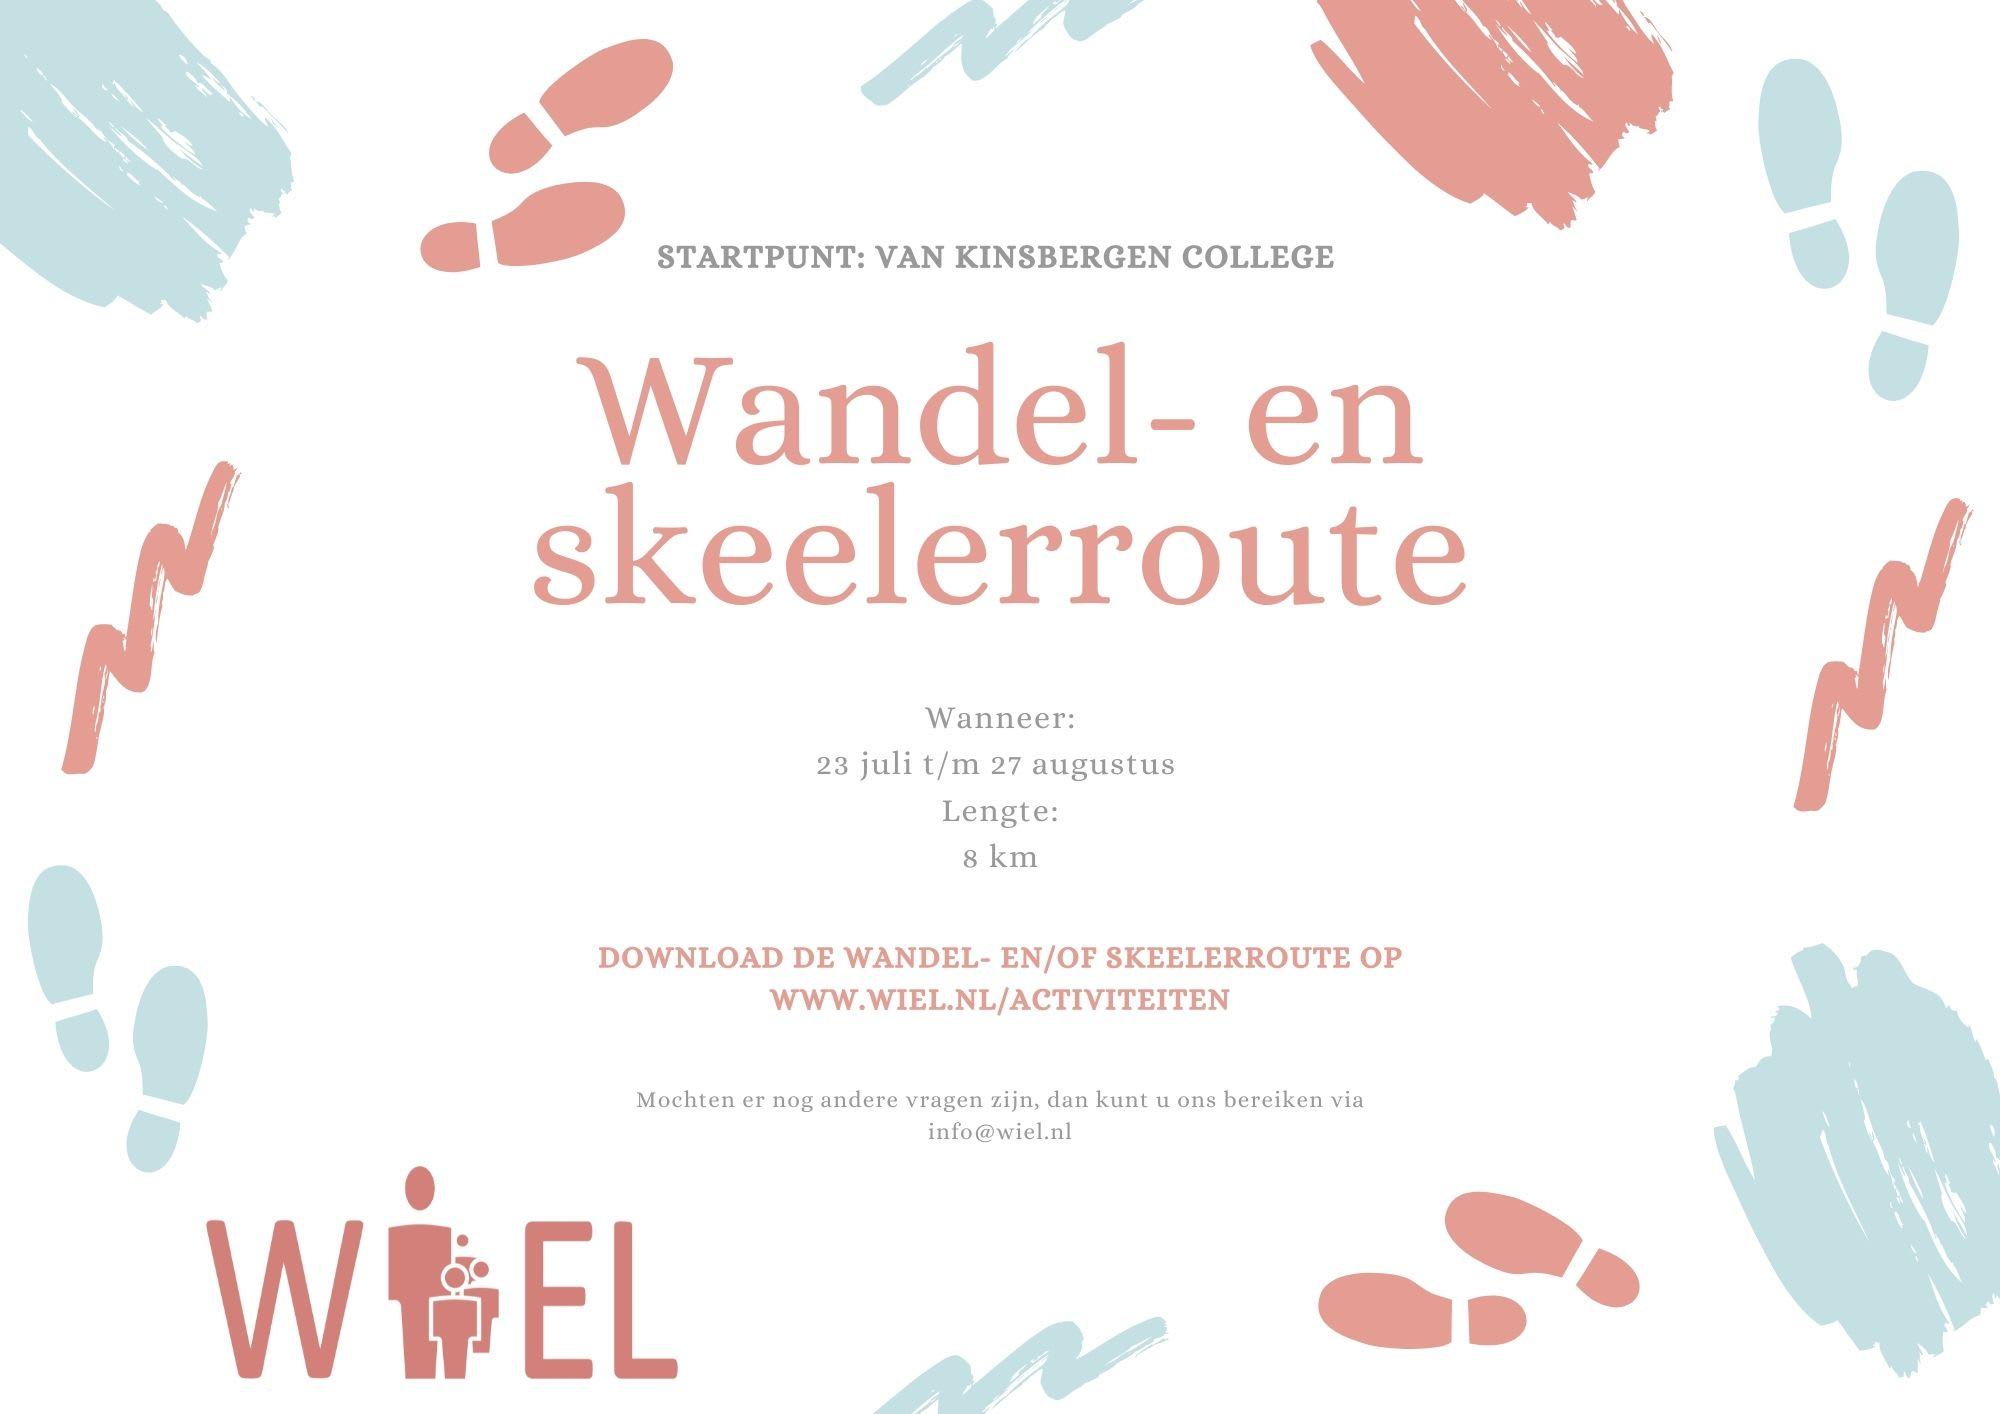 Wandel- en skeelerroute - Stichting WIEL